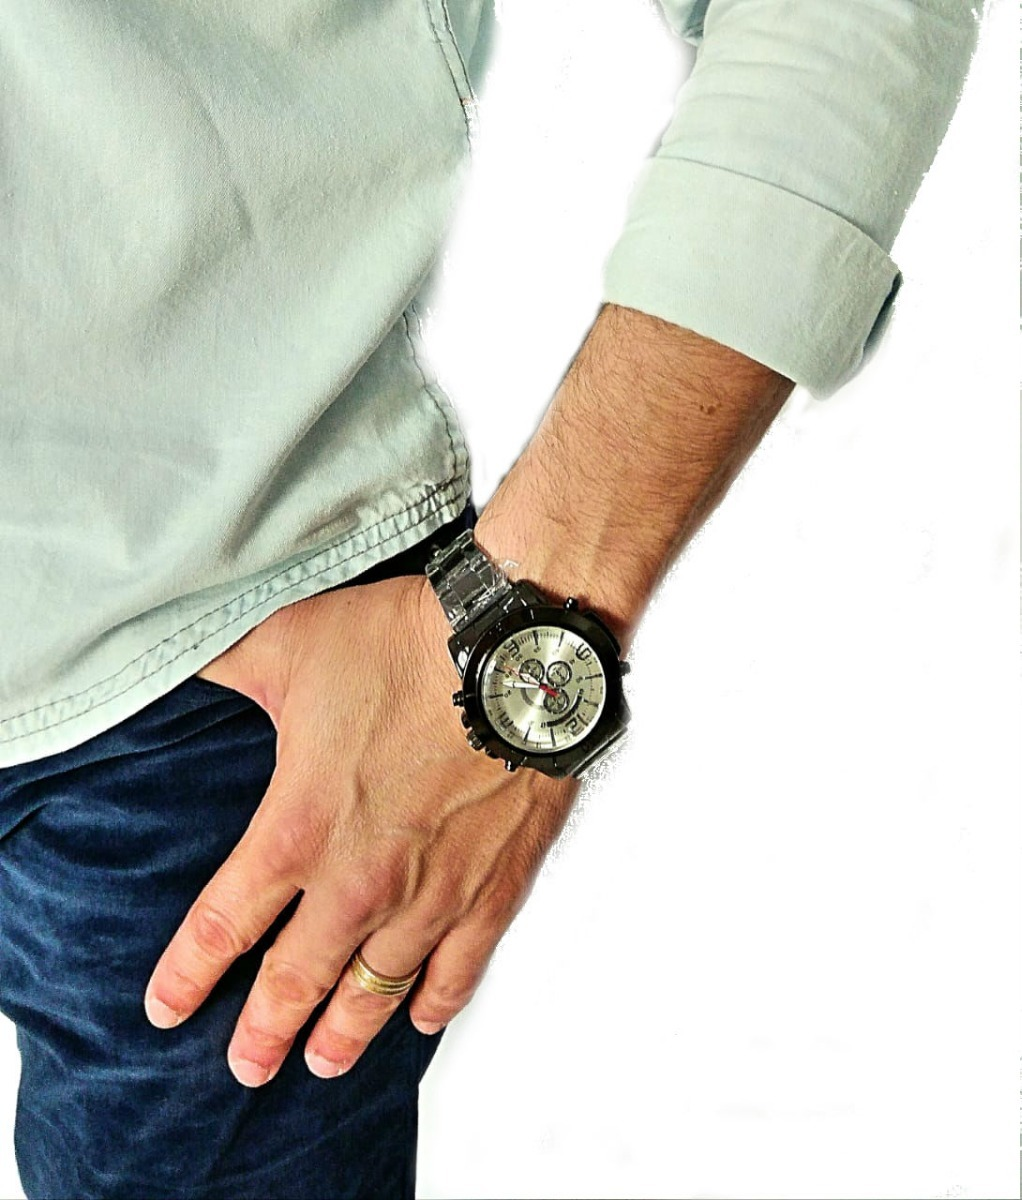 e4aa6b3f9b2 Relógio De Pulso Analógico Preto Masculino Luxo Esportivo - R  39